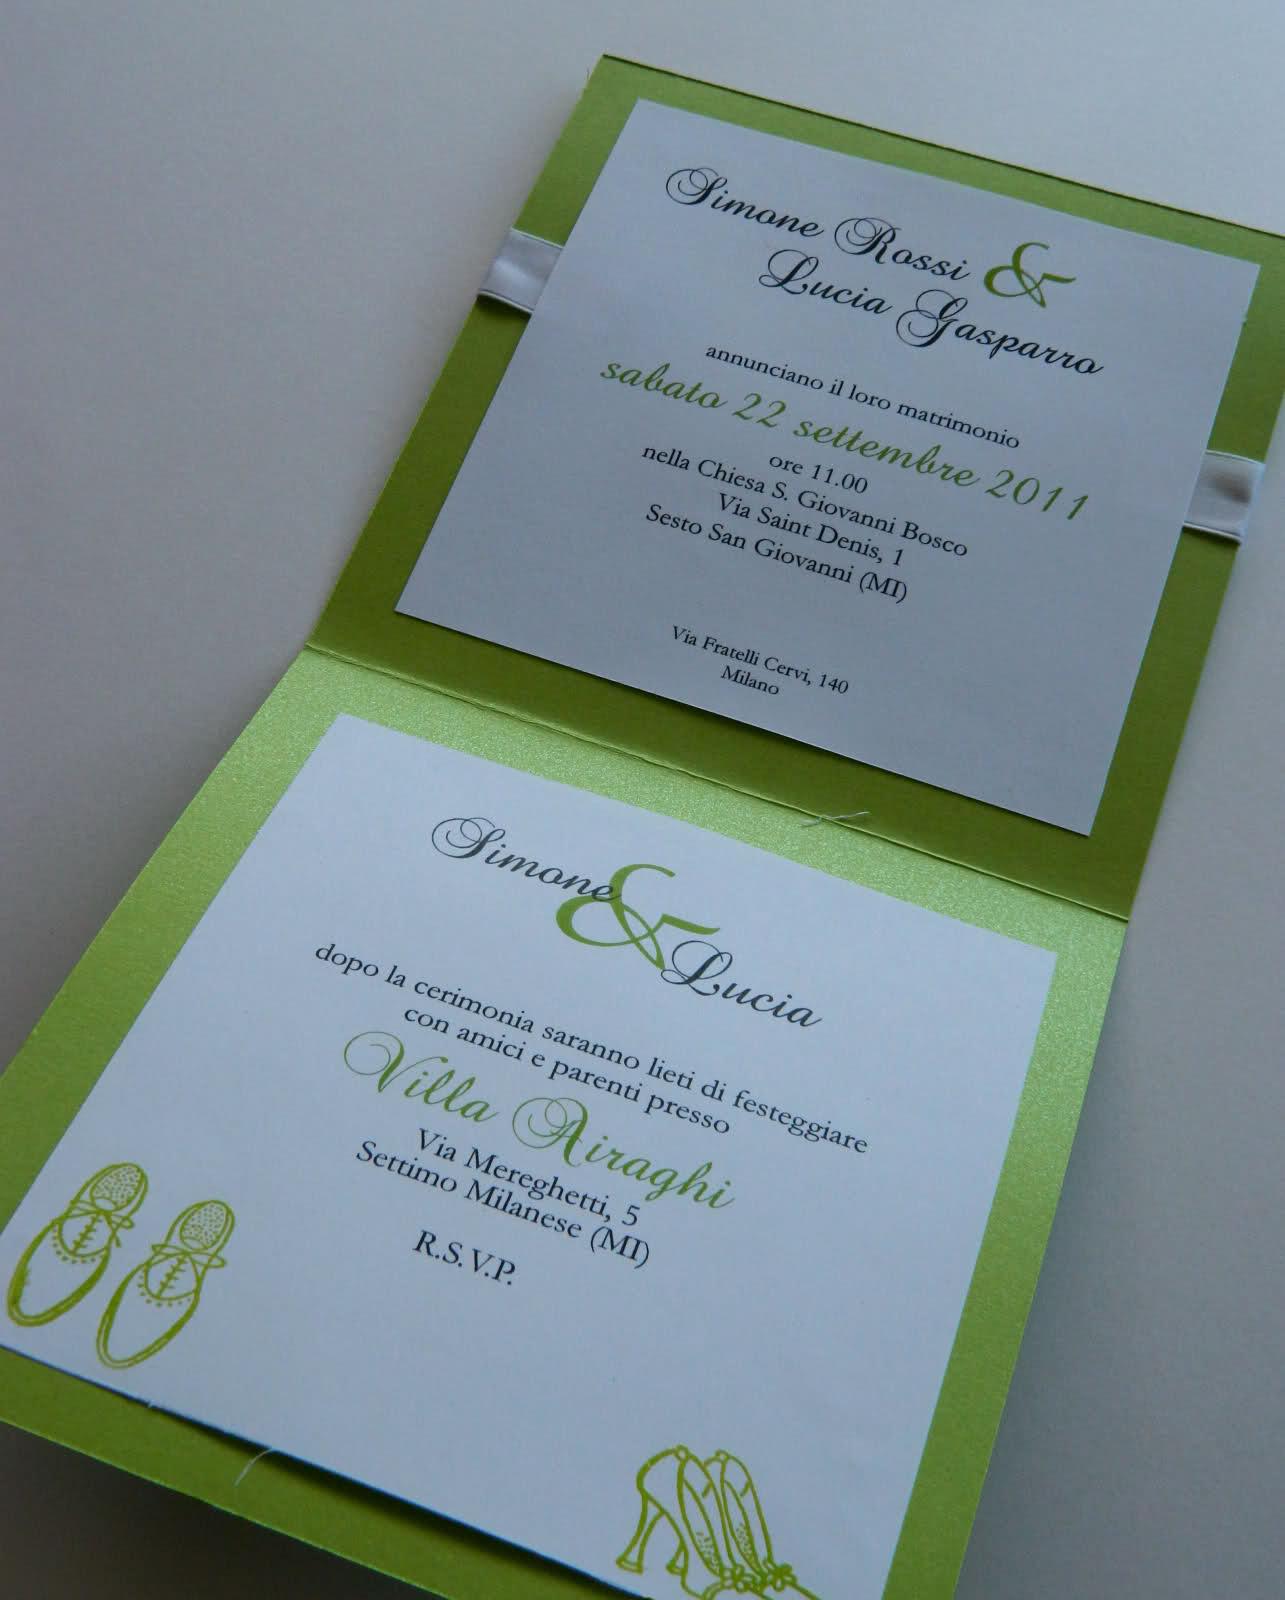 Segnaposto Matrimonio Verde Mela.Guida Al Matrimonio Colore Avorio E Verde Mela